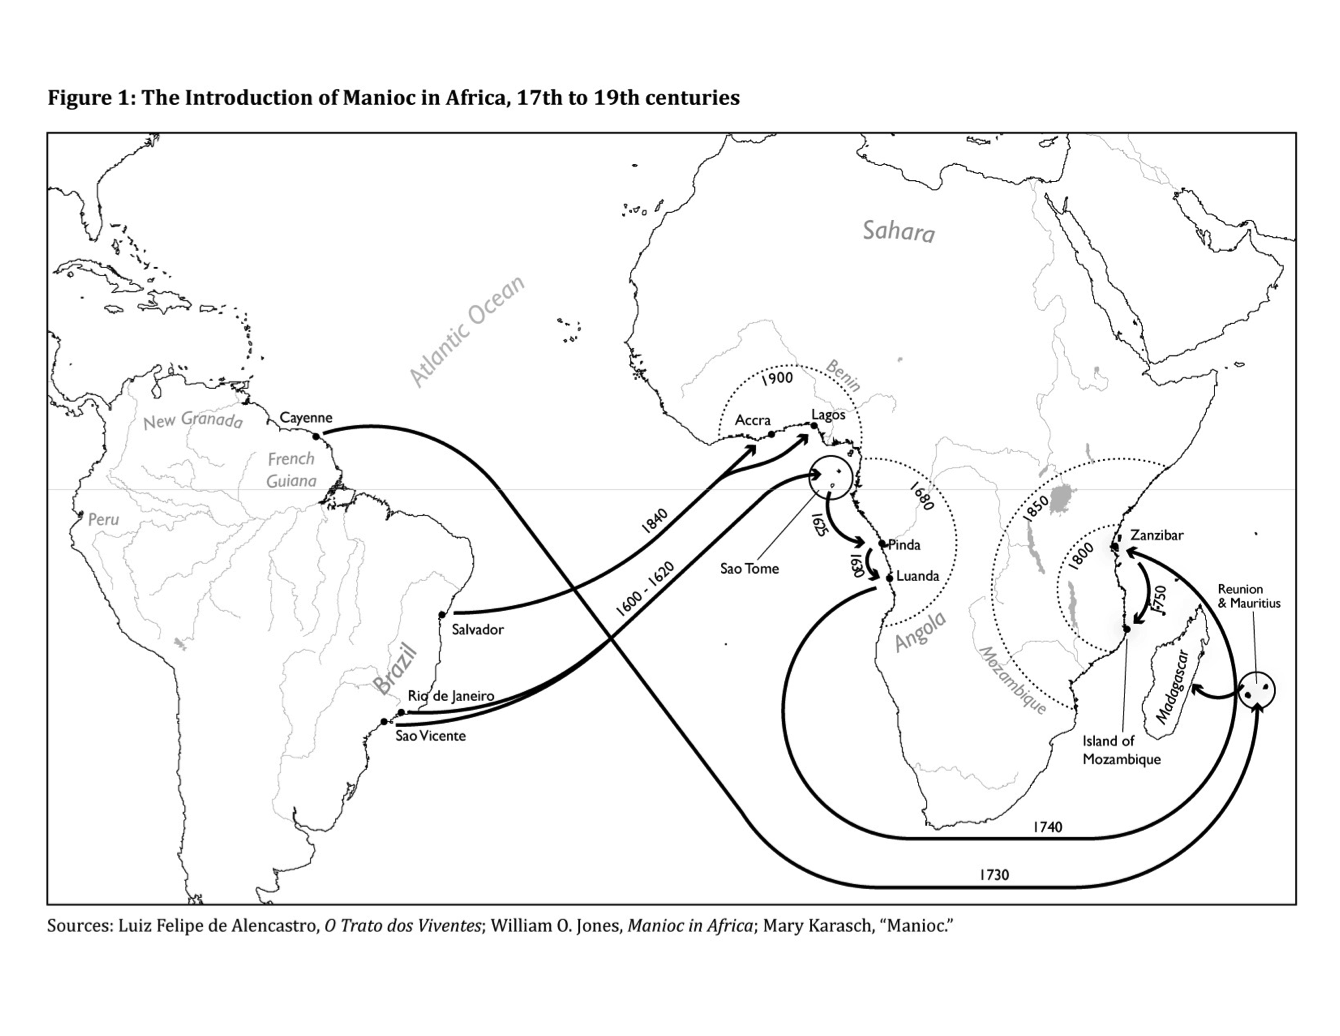 The South Atlantic Columbian Exchange